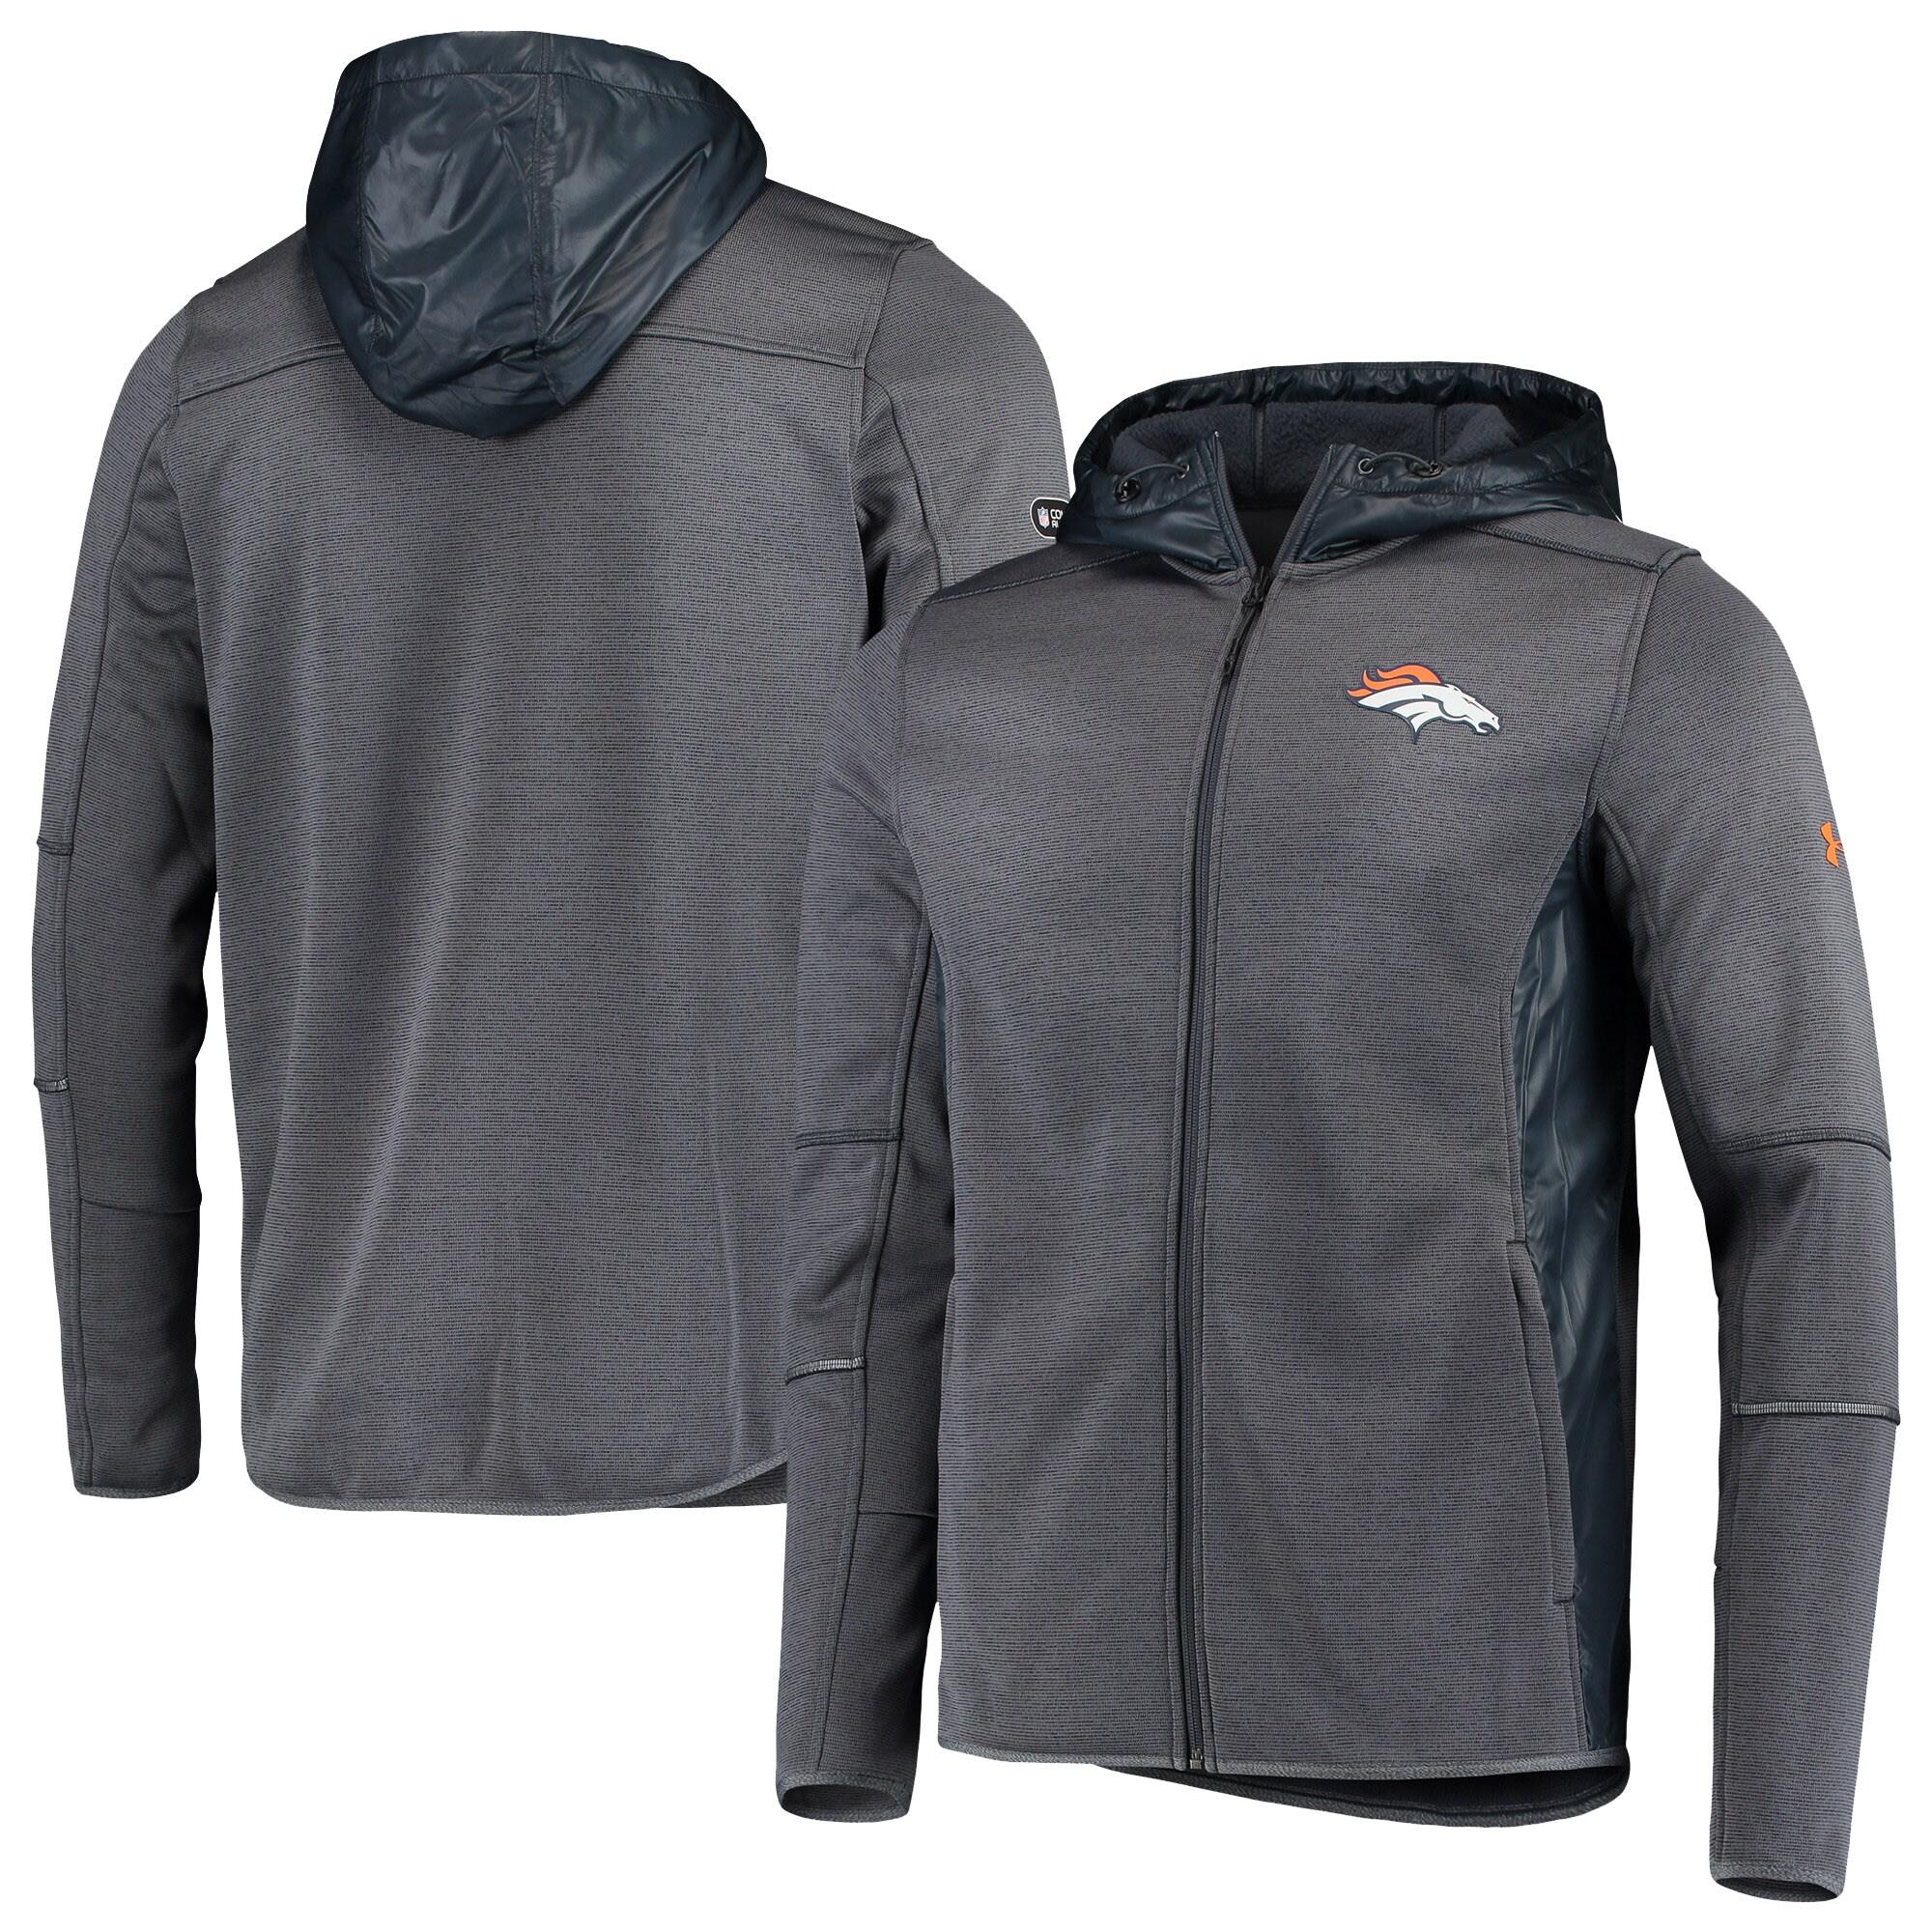 Denver Broncos Under Armour Combine Authentic Full-Zip Swacket - Charcoal